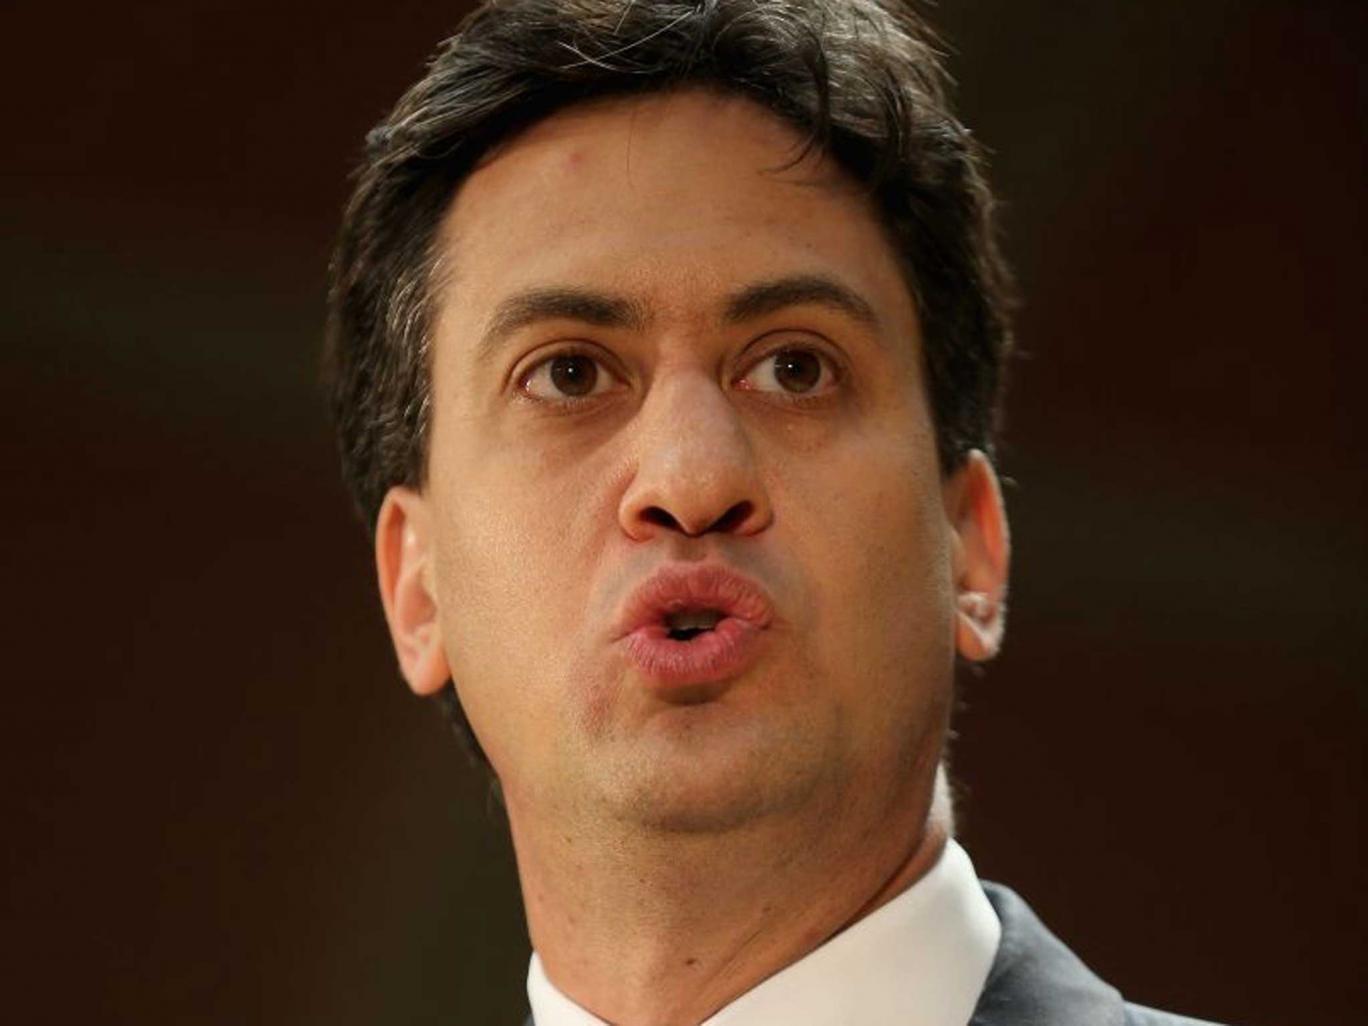 Restoring trust: Ed Miliband